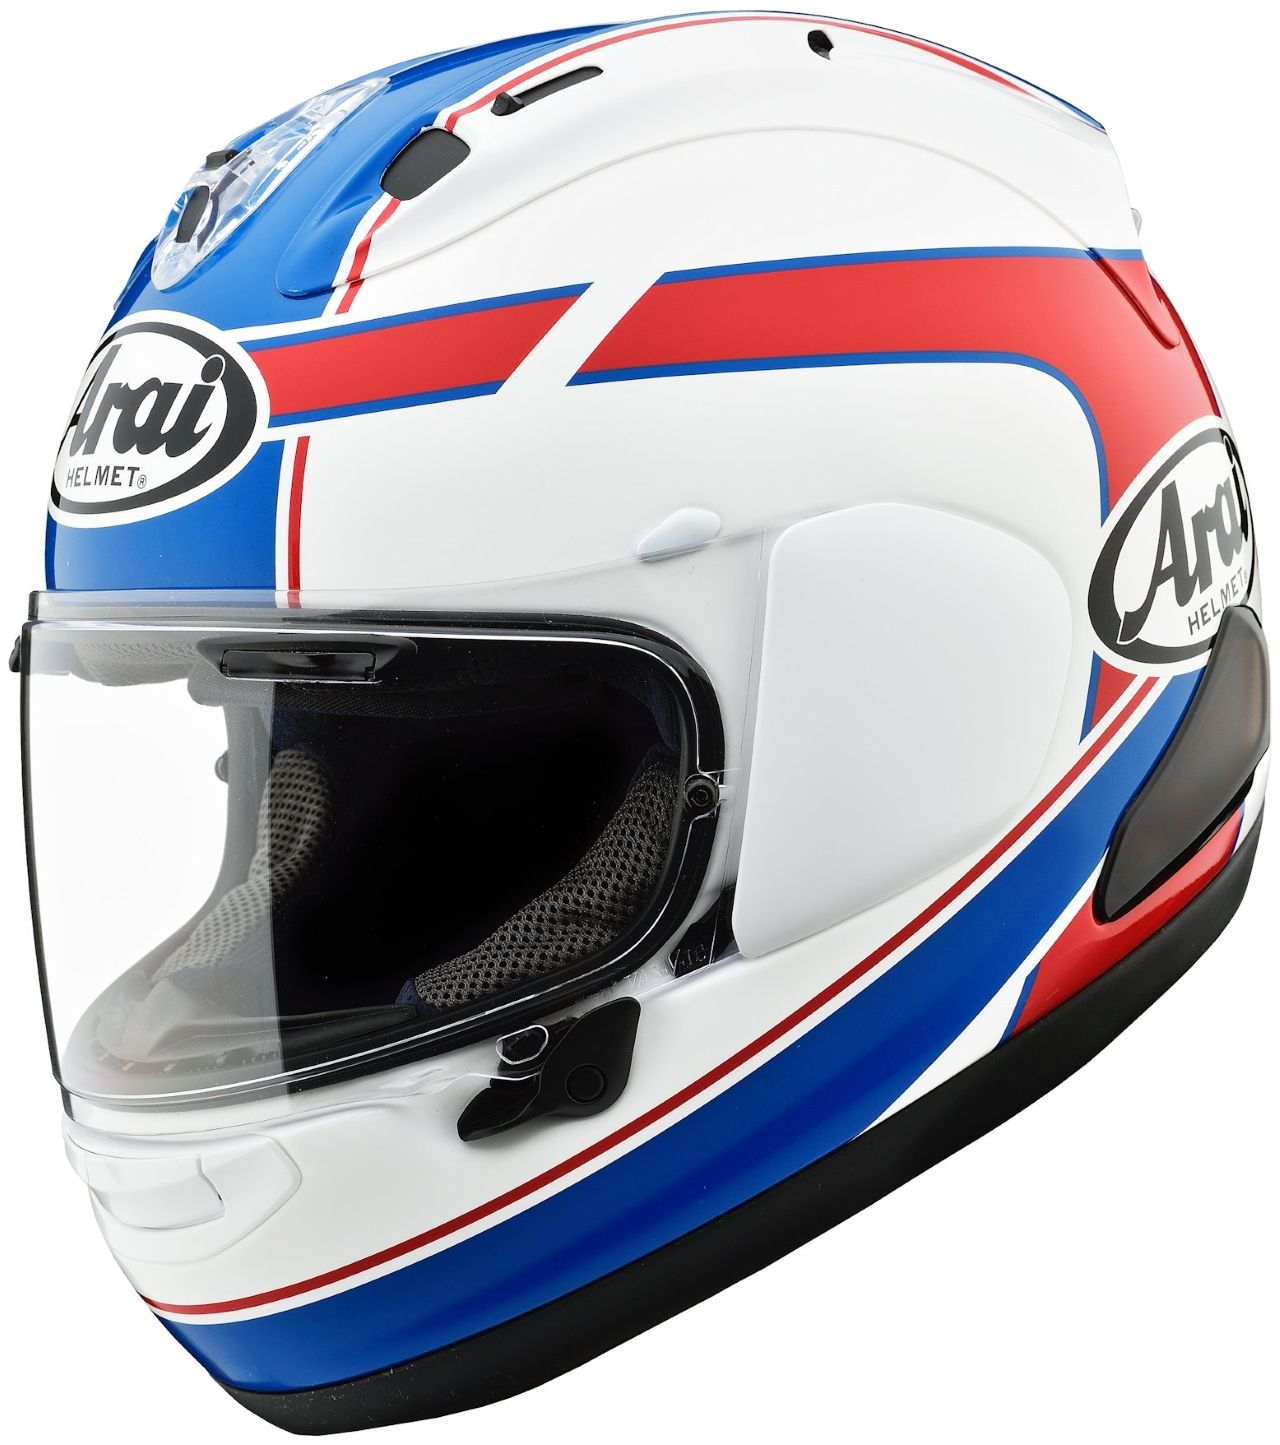 Araiアライ/RX-7X SCHWANTZ [シュワンツ] ヘルメット